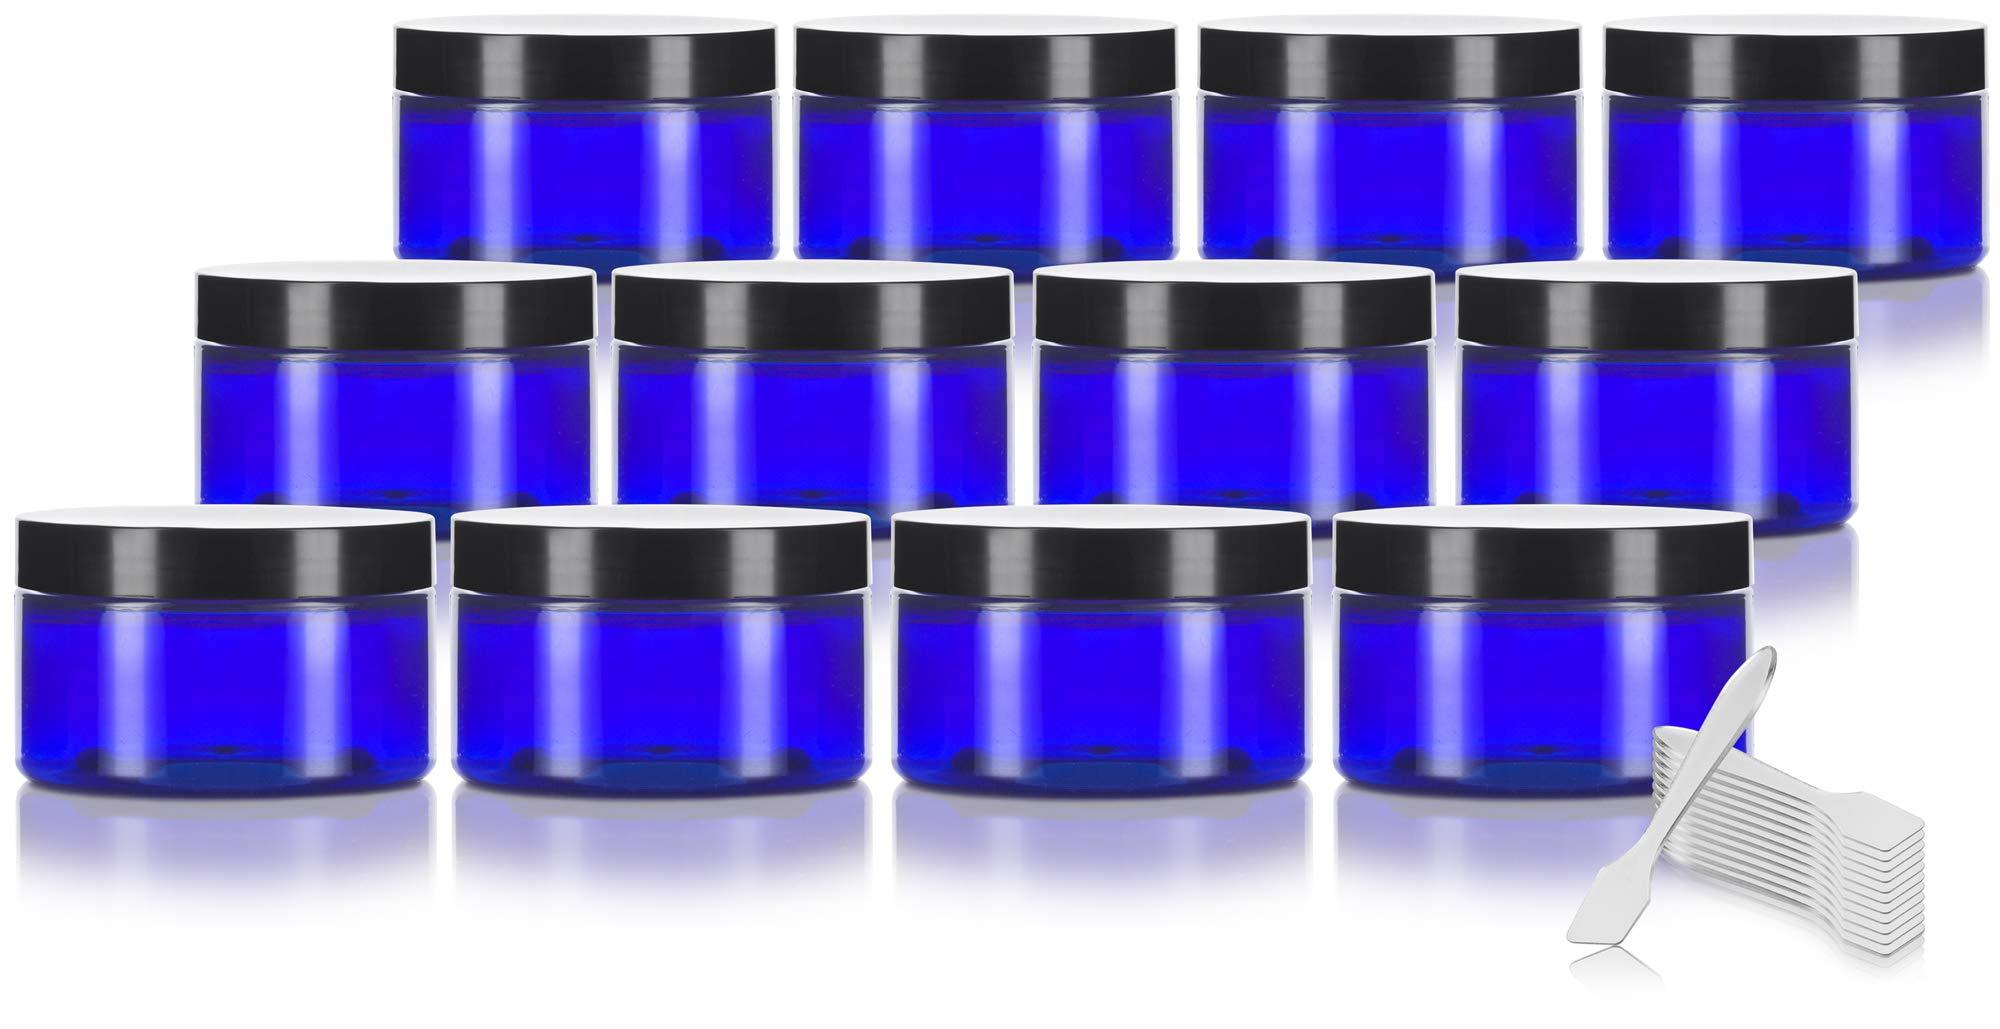 Cobalt Blue 4 oz PET Plastic (BPA Free) Refillable Low Profile Jar (12 pack) + Spatulas by JUVITUS